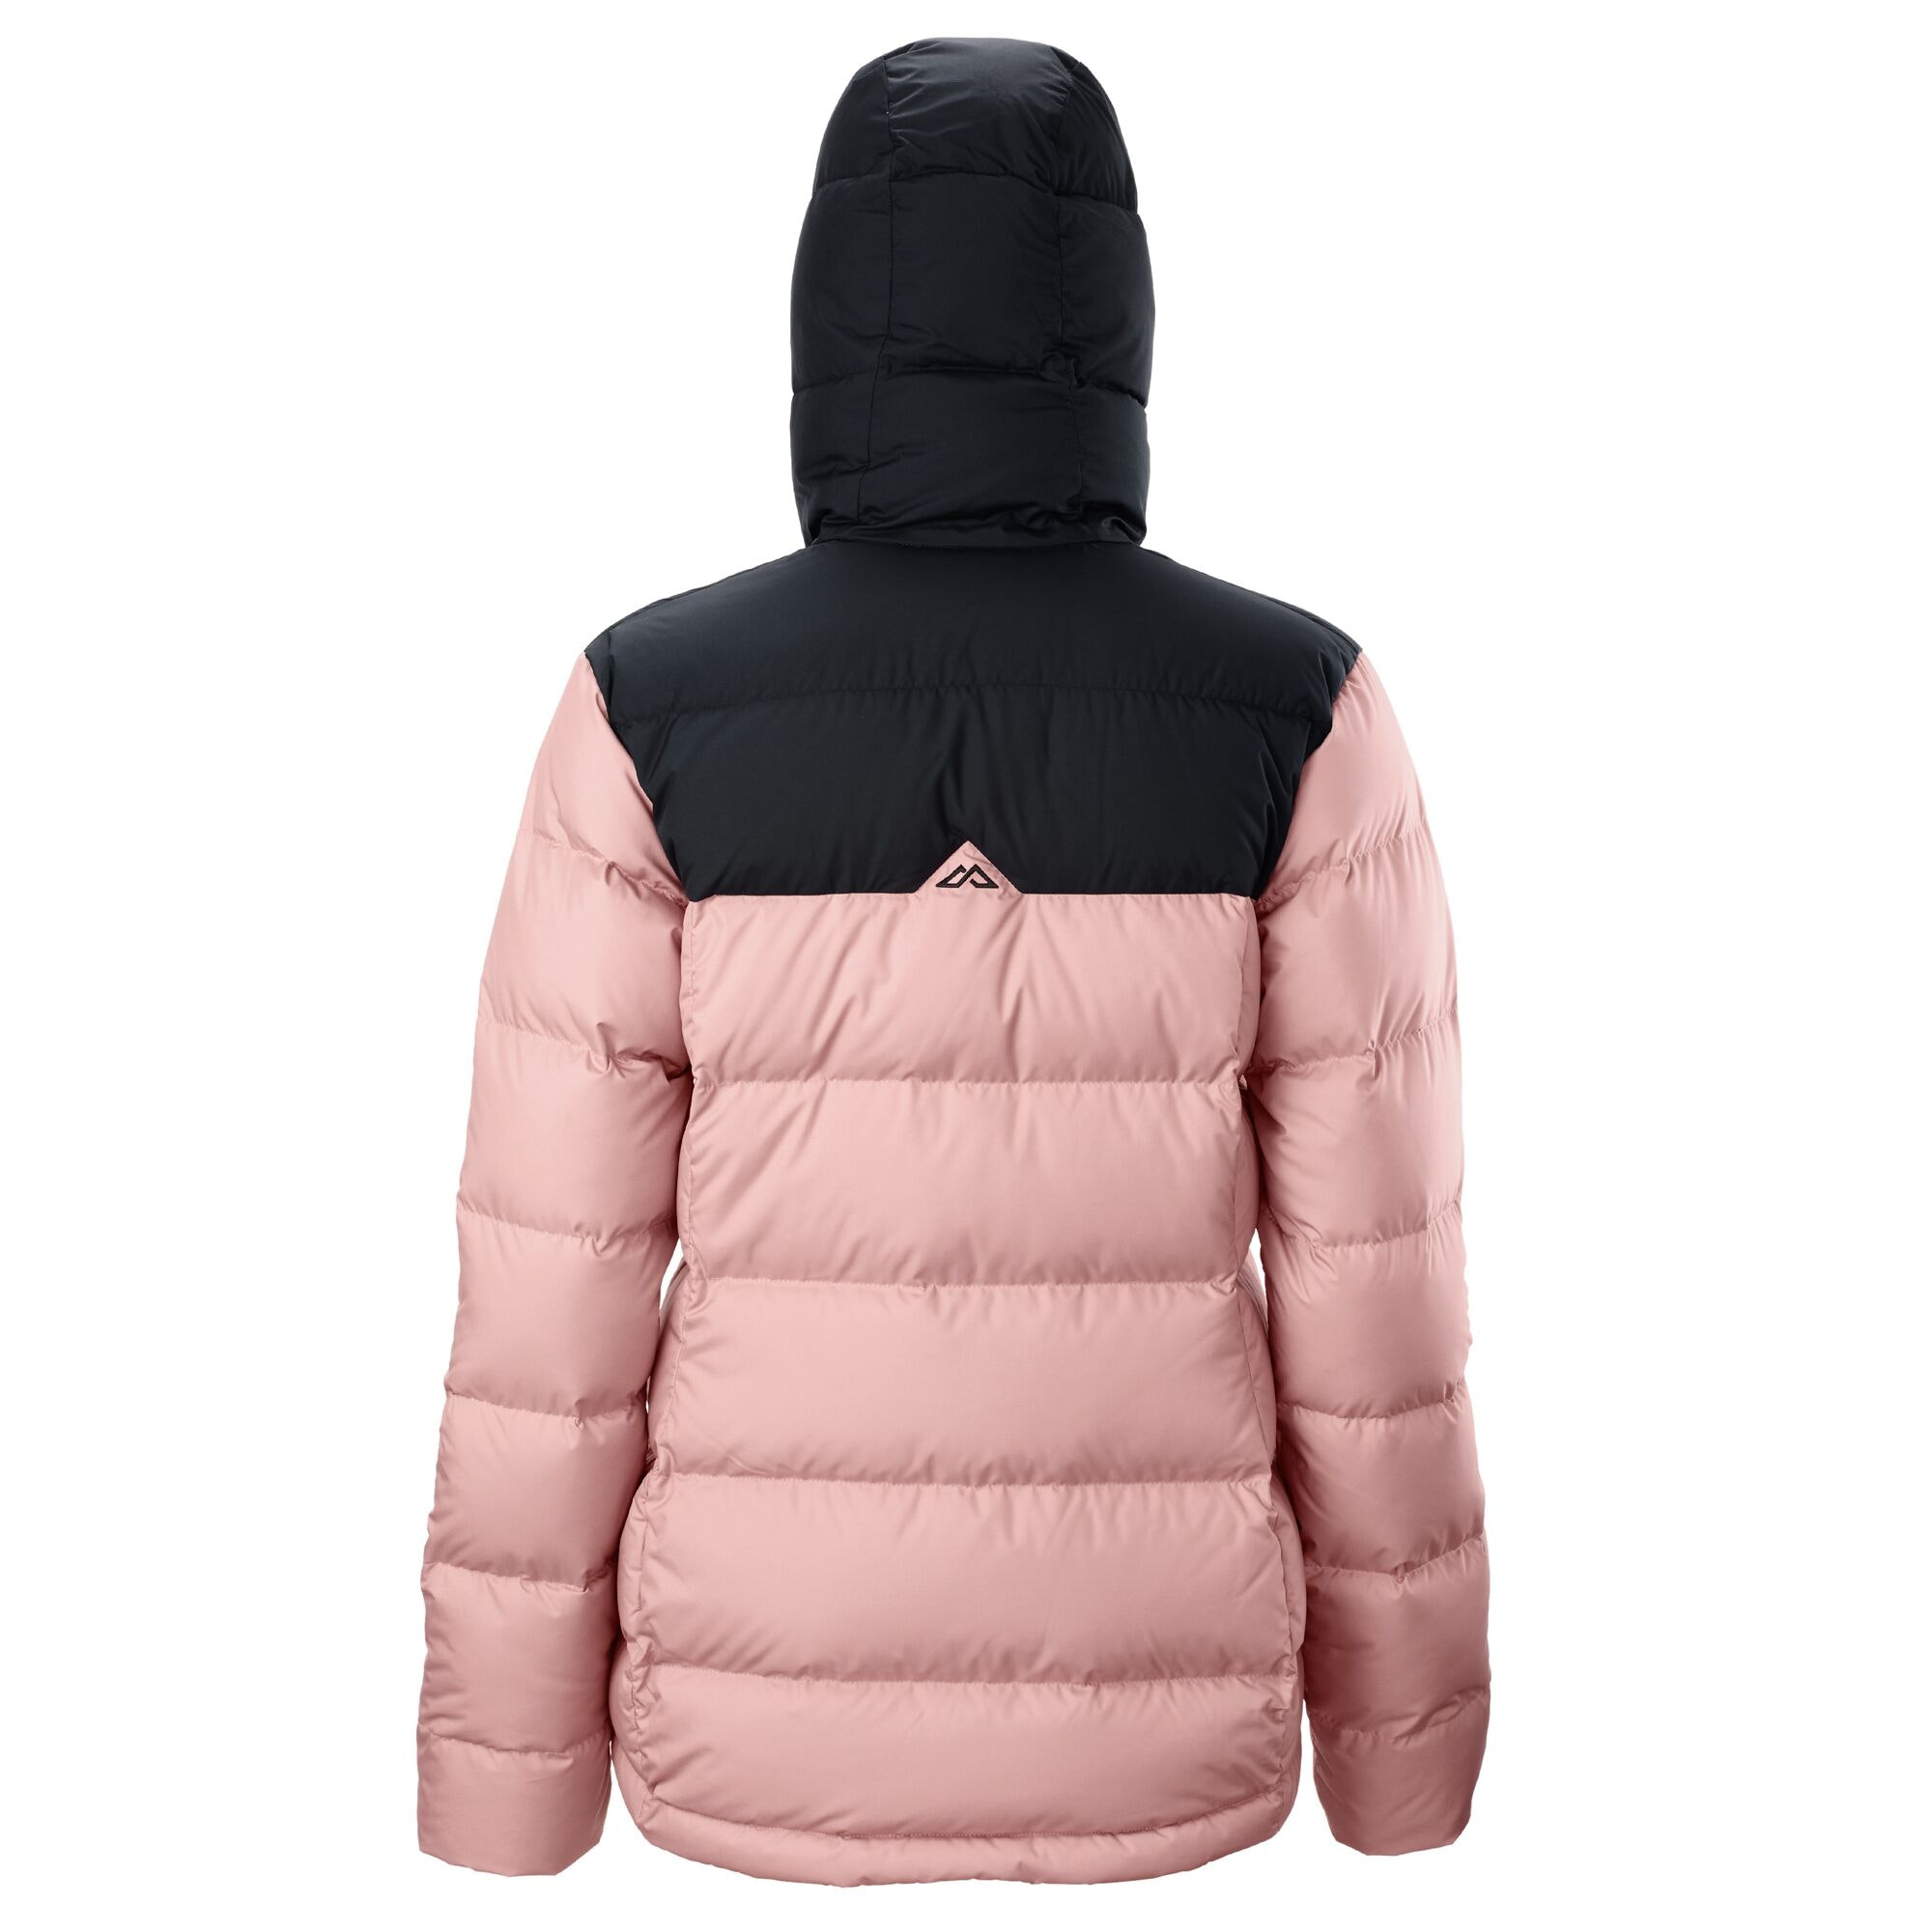 thumbnail 24 - NEW Kathmandu Epiq Womens Hooded Down Puffer 600 Fill Warm Outdoor Winter Jacket